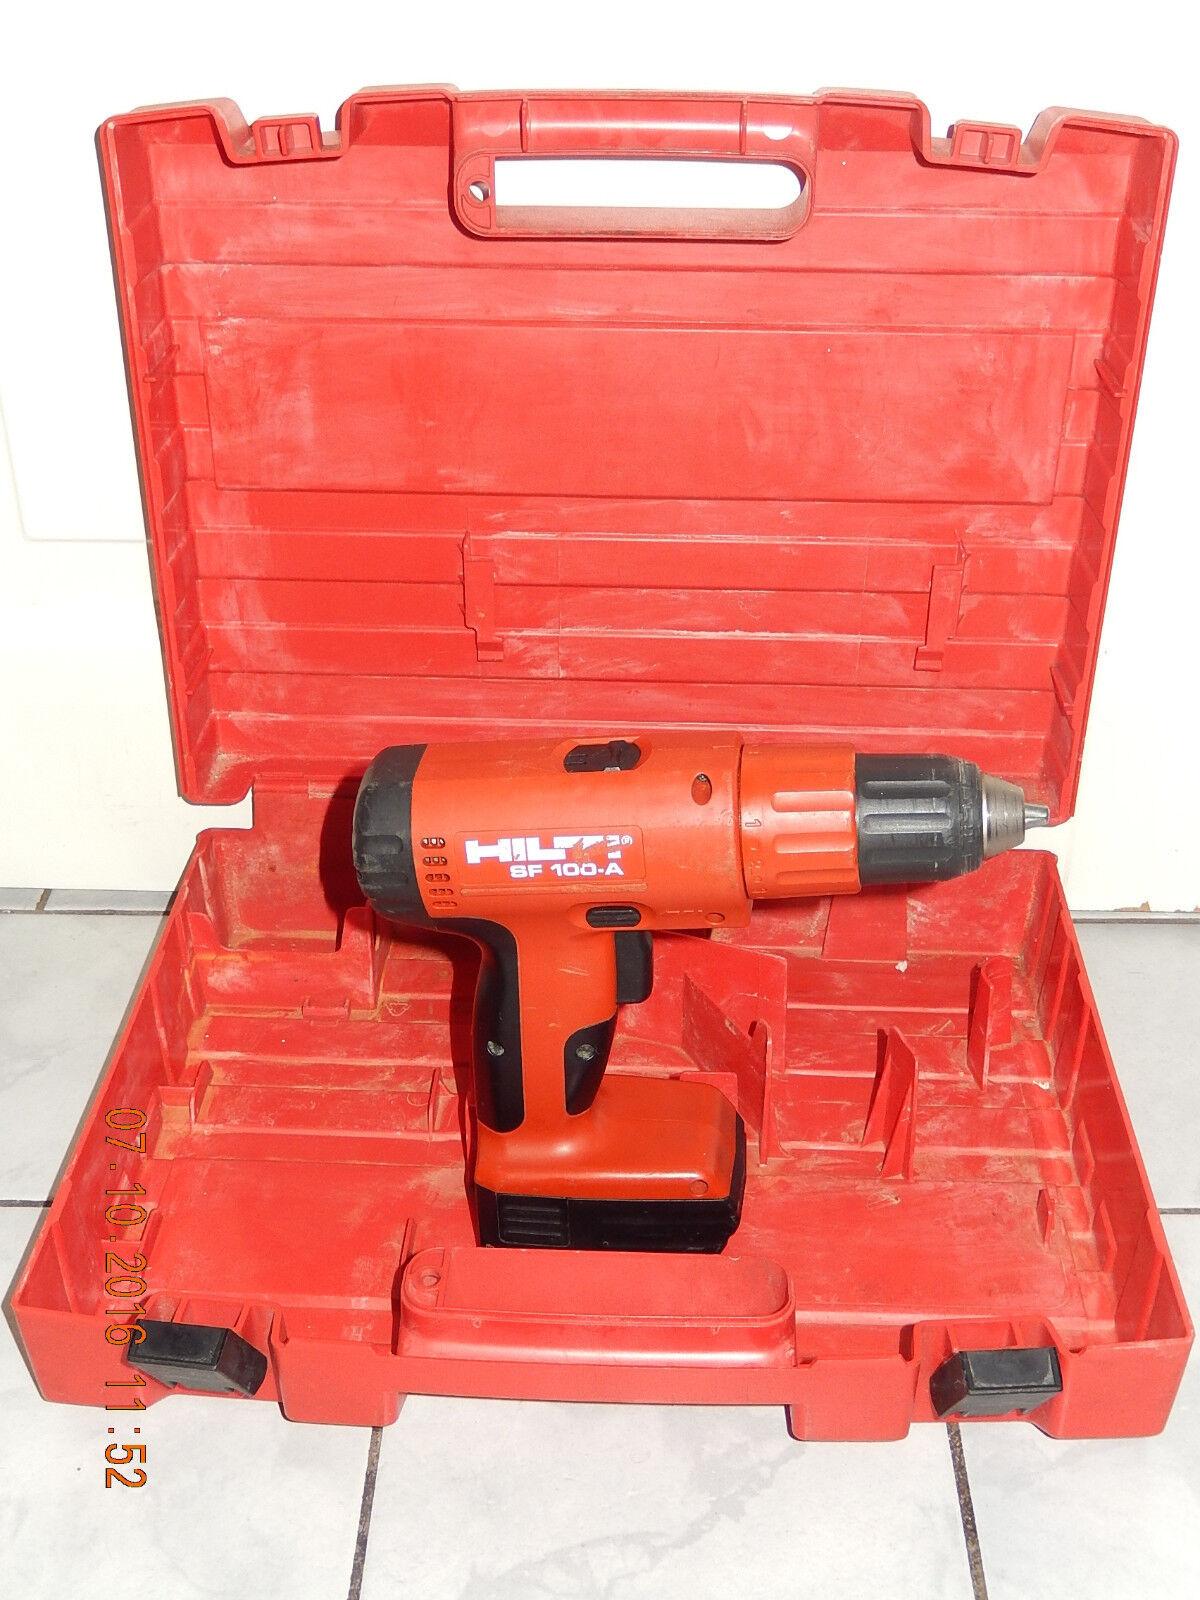 HILTI SB10 PROFI-Akkubohrschrauber aus 2001+AKKU+Akkulader,geprüft,von PRIVAT